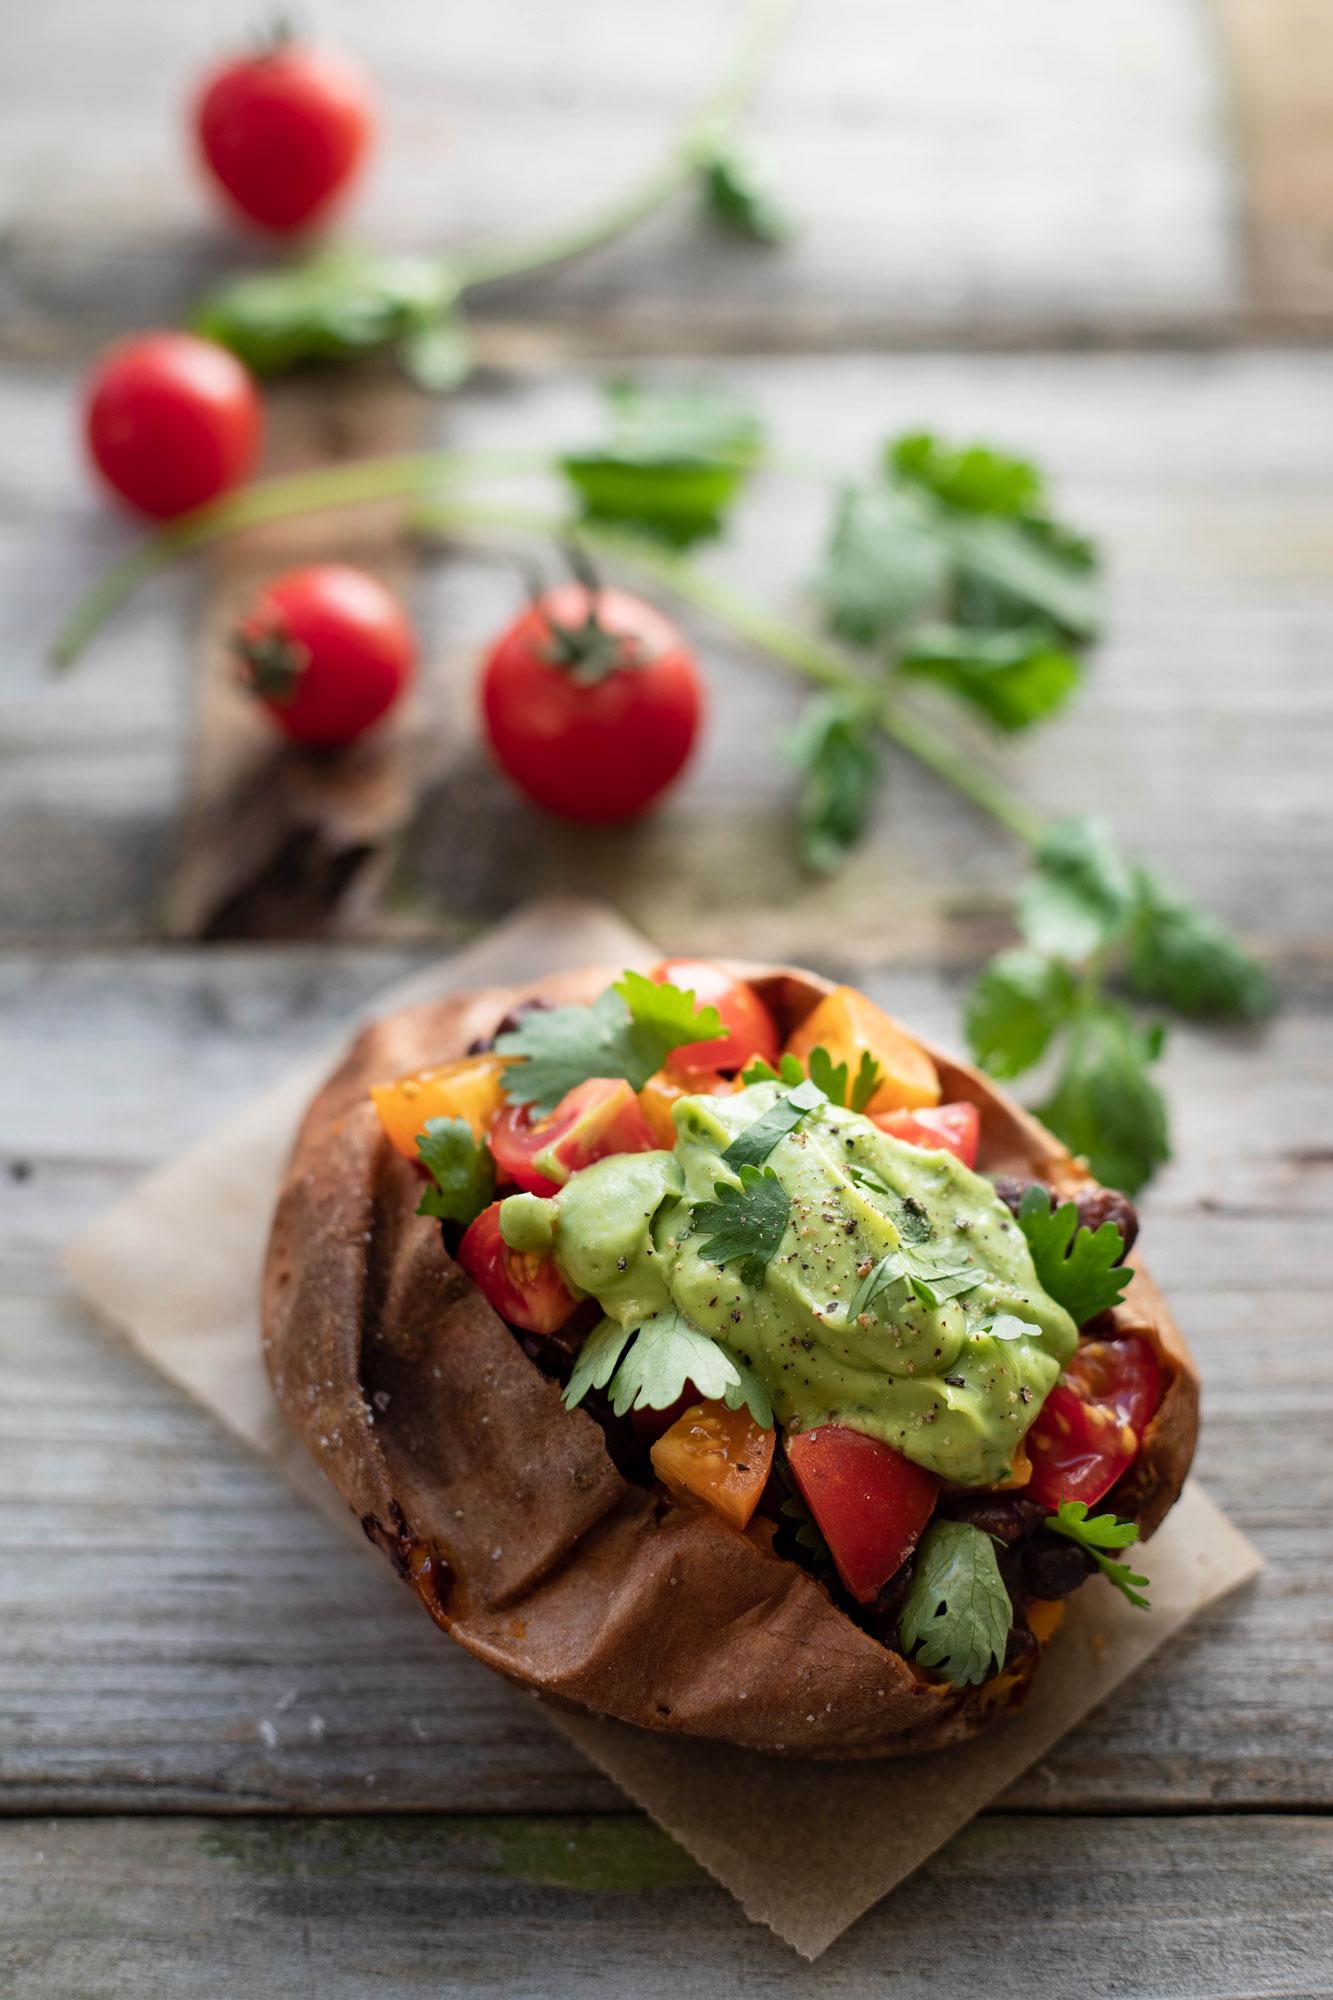 vegan and gluten free Mexican stuffed sweet potatoes